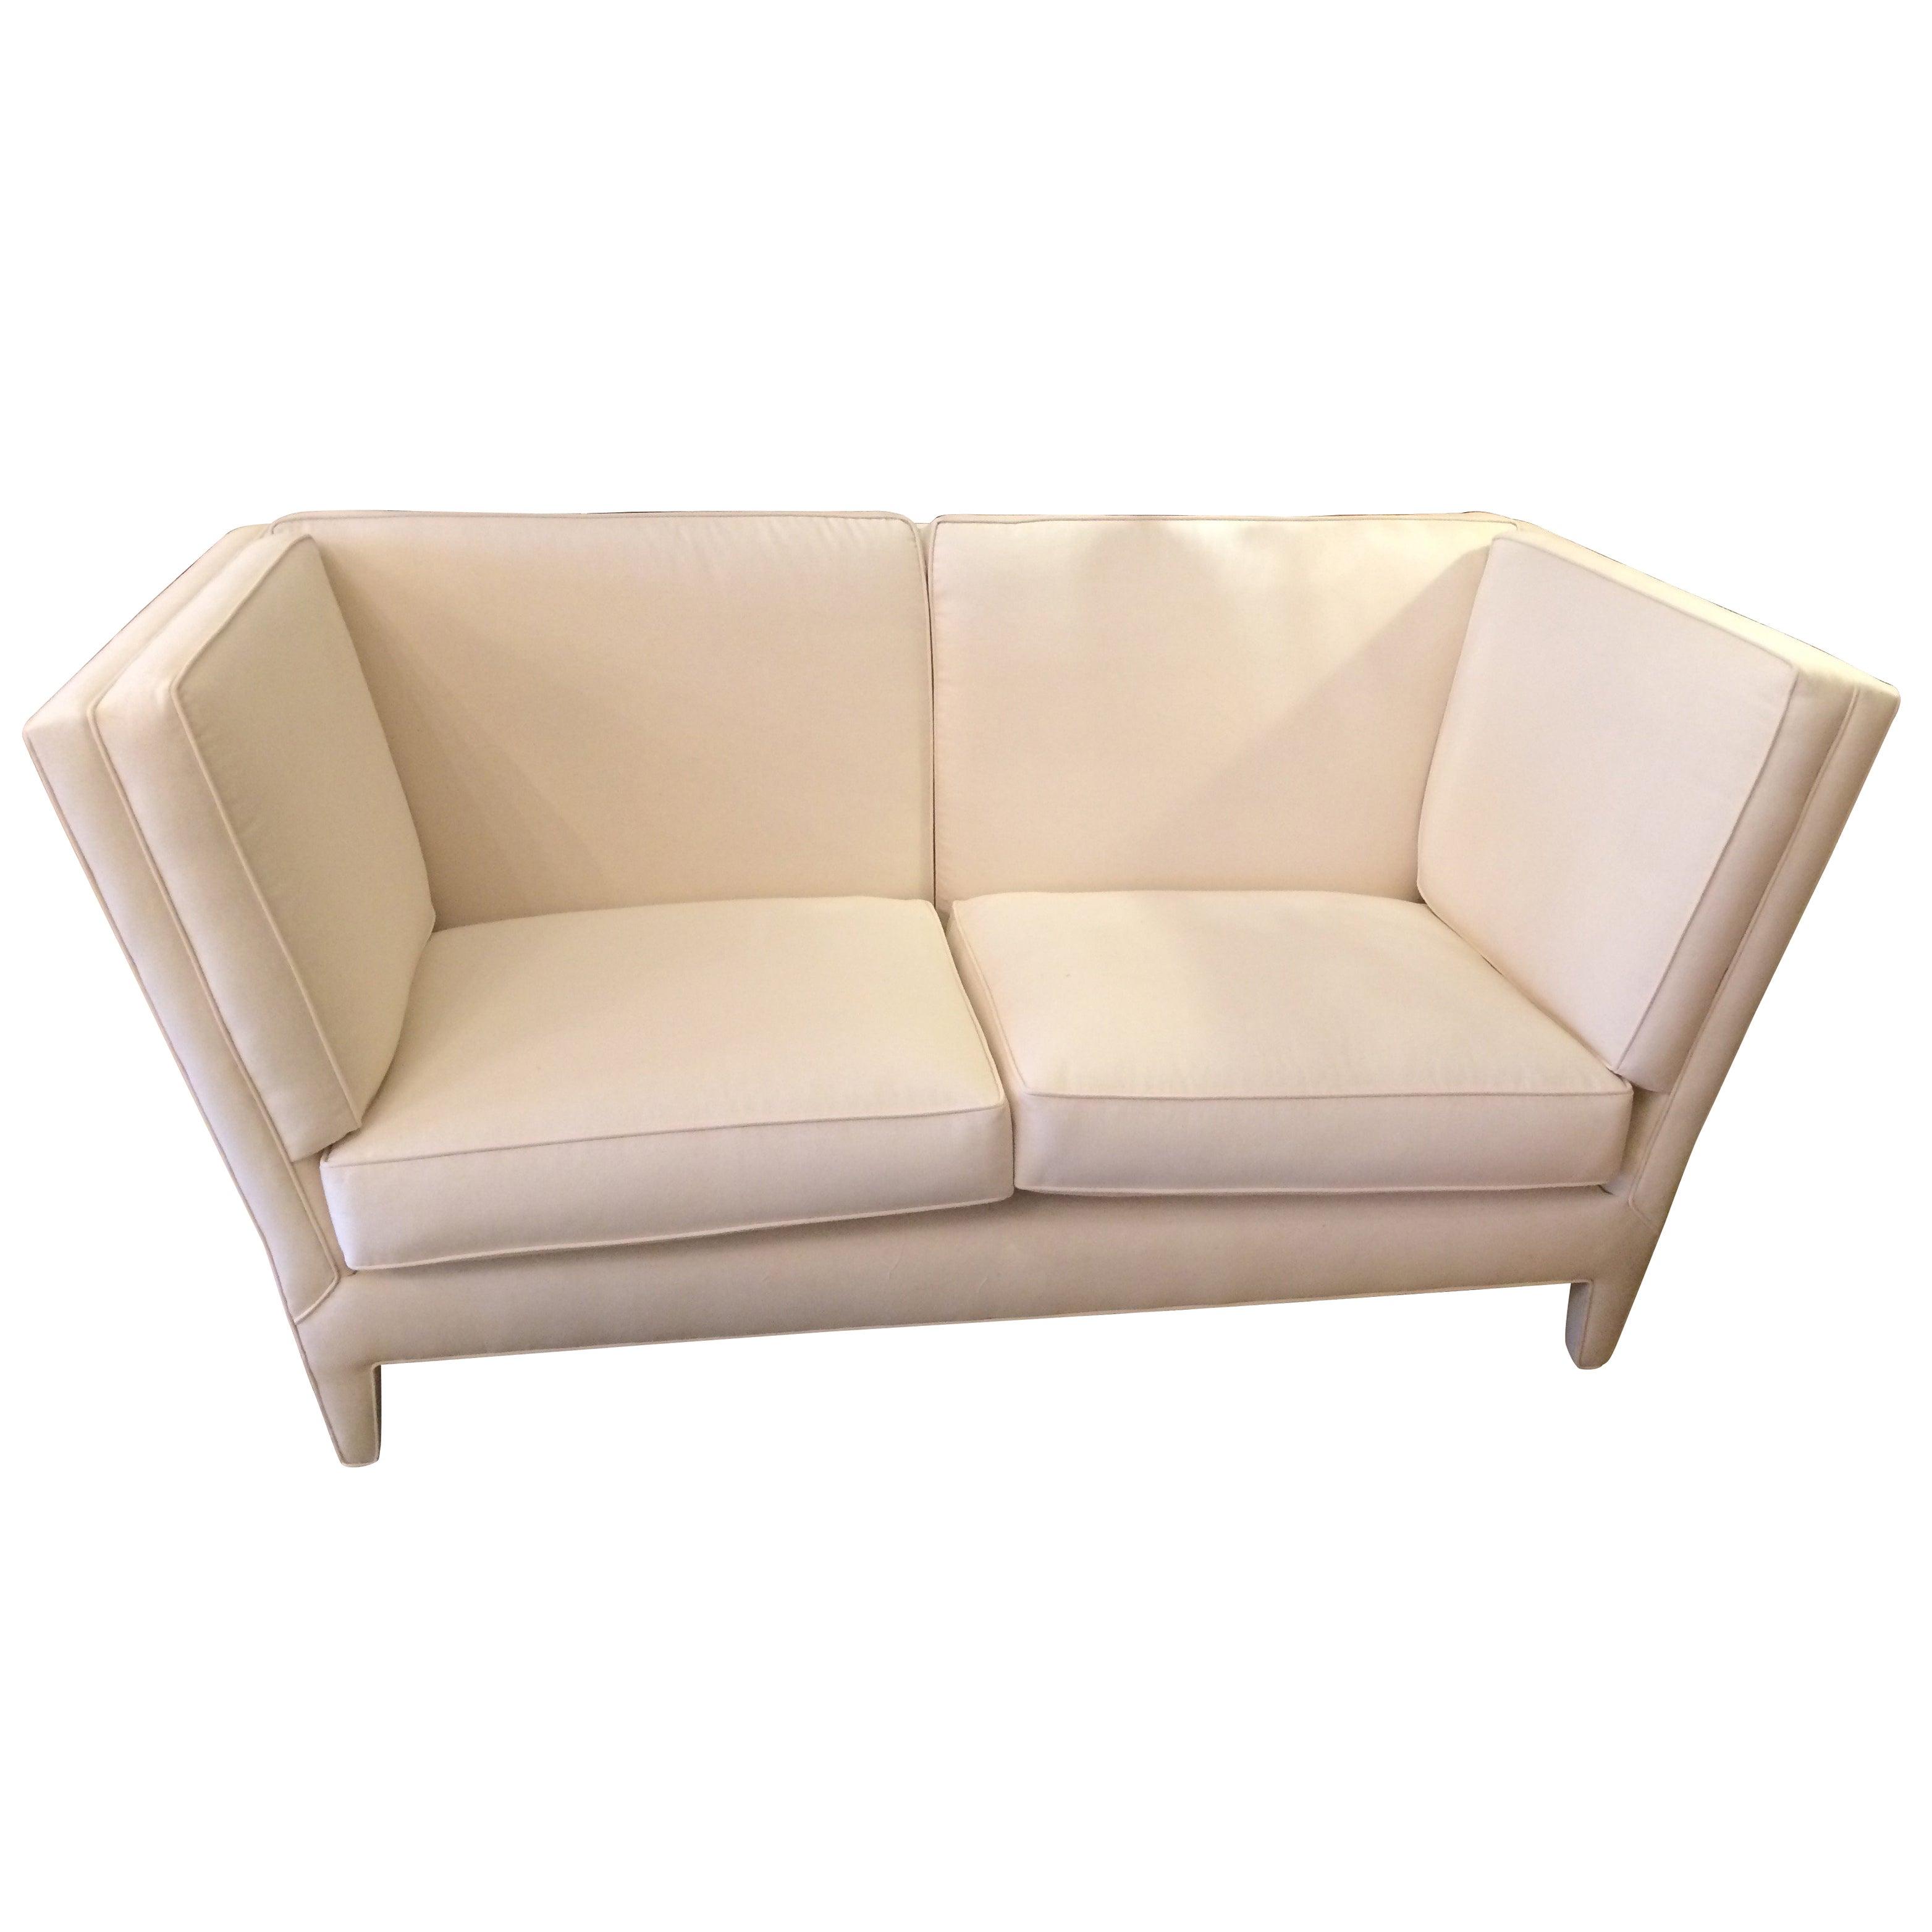 design level loveseat houe filter prrenderer list modular q fr scandinavia outdoor couch bamboo s pn lang service layout wa ps en index